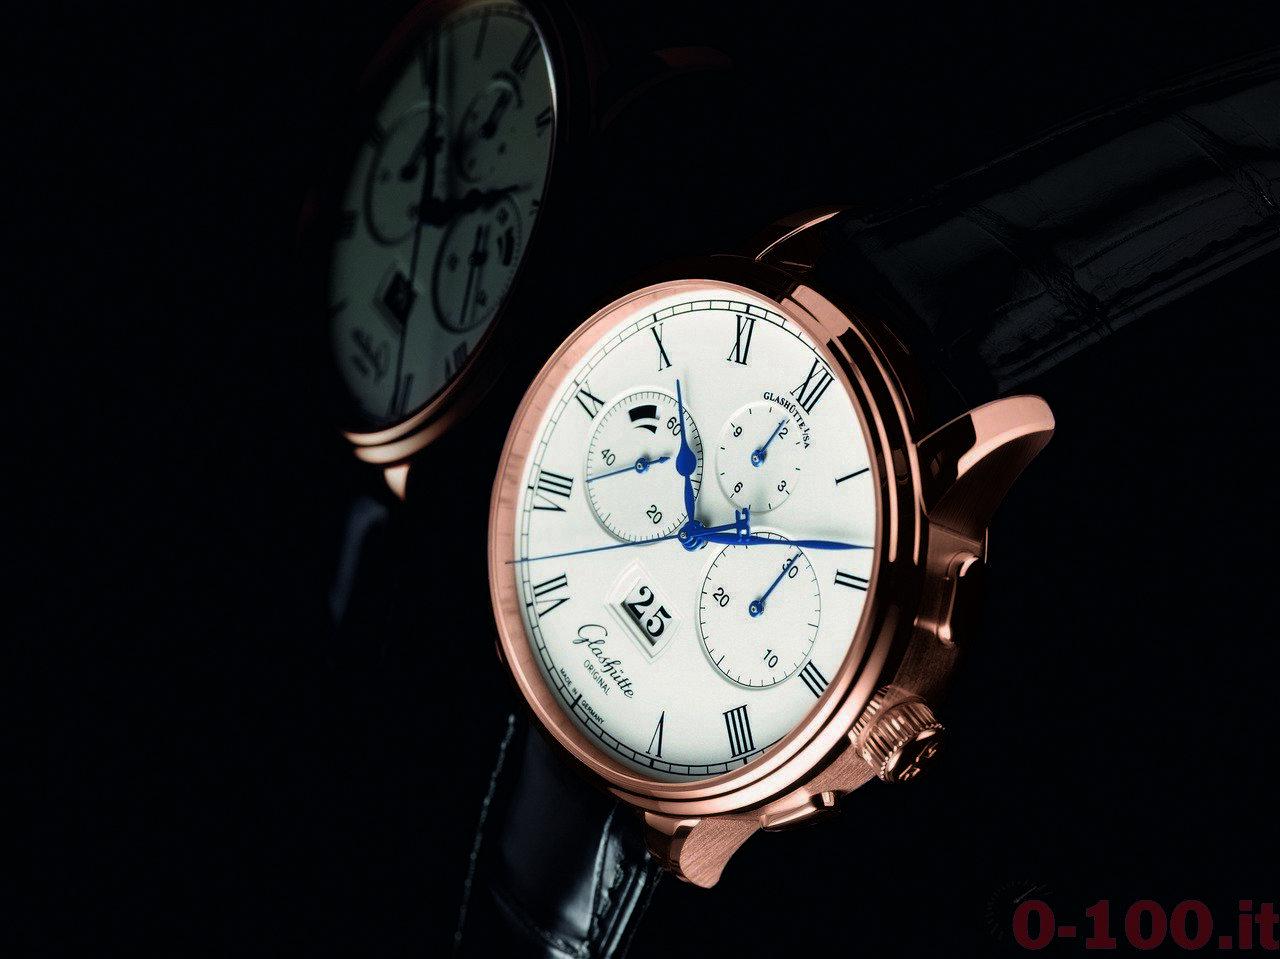 glashuette-original-senator-chronograph-panorama-date-baselworld-2014_0-100_2